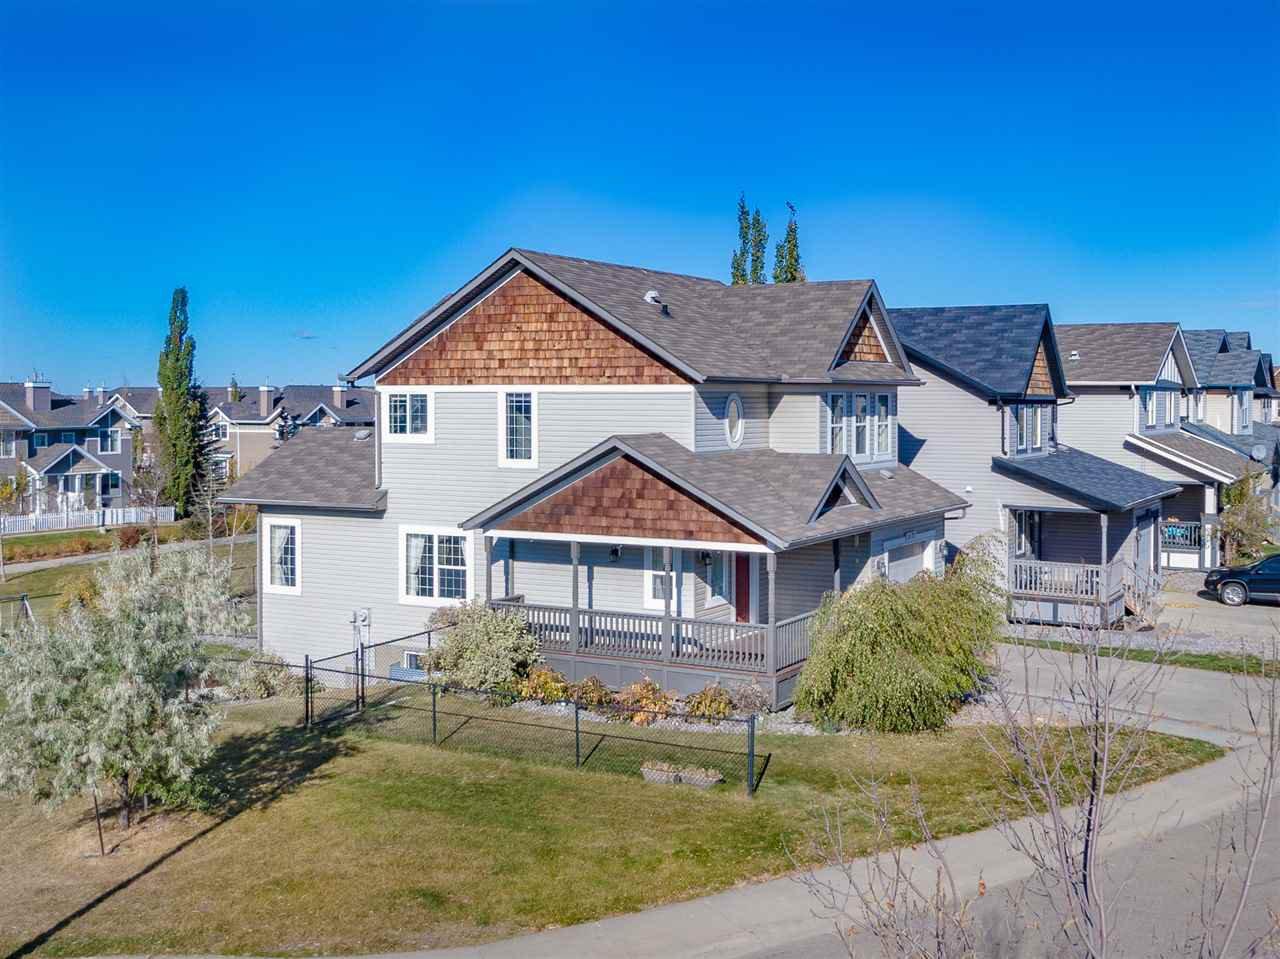 Main Photo: 3177 TRELLE Loop in Edmonton: Zone 14 House for sale : MLS®# E4217713